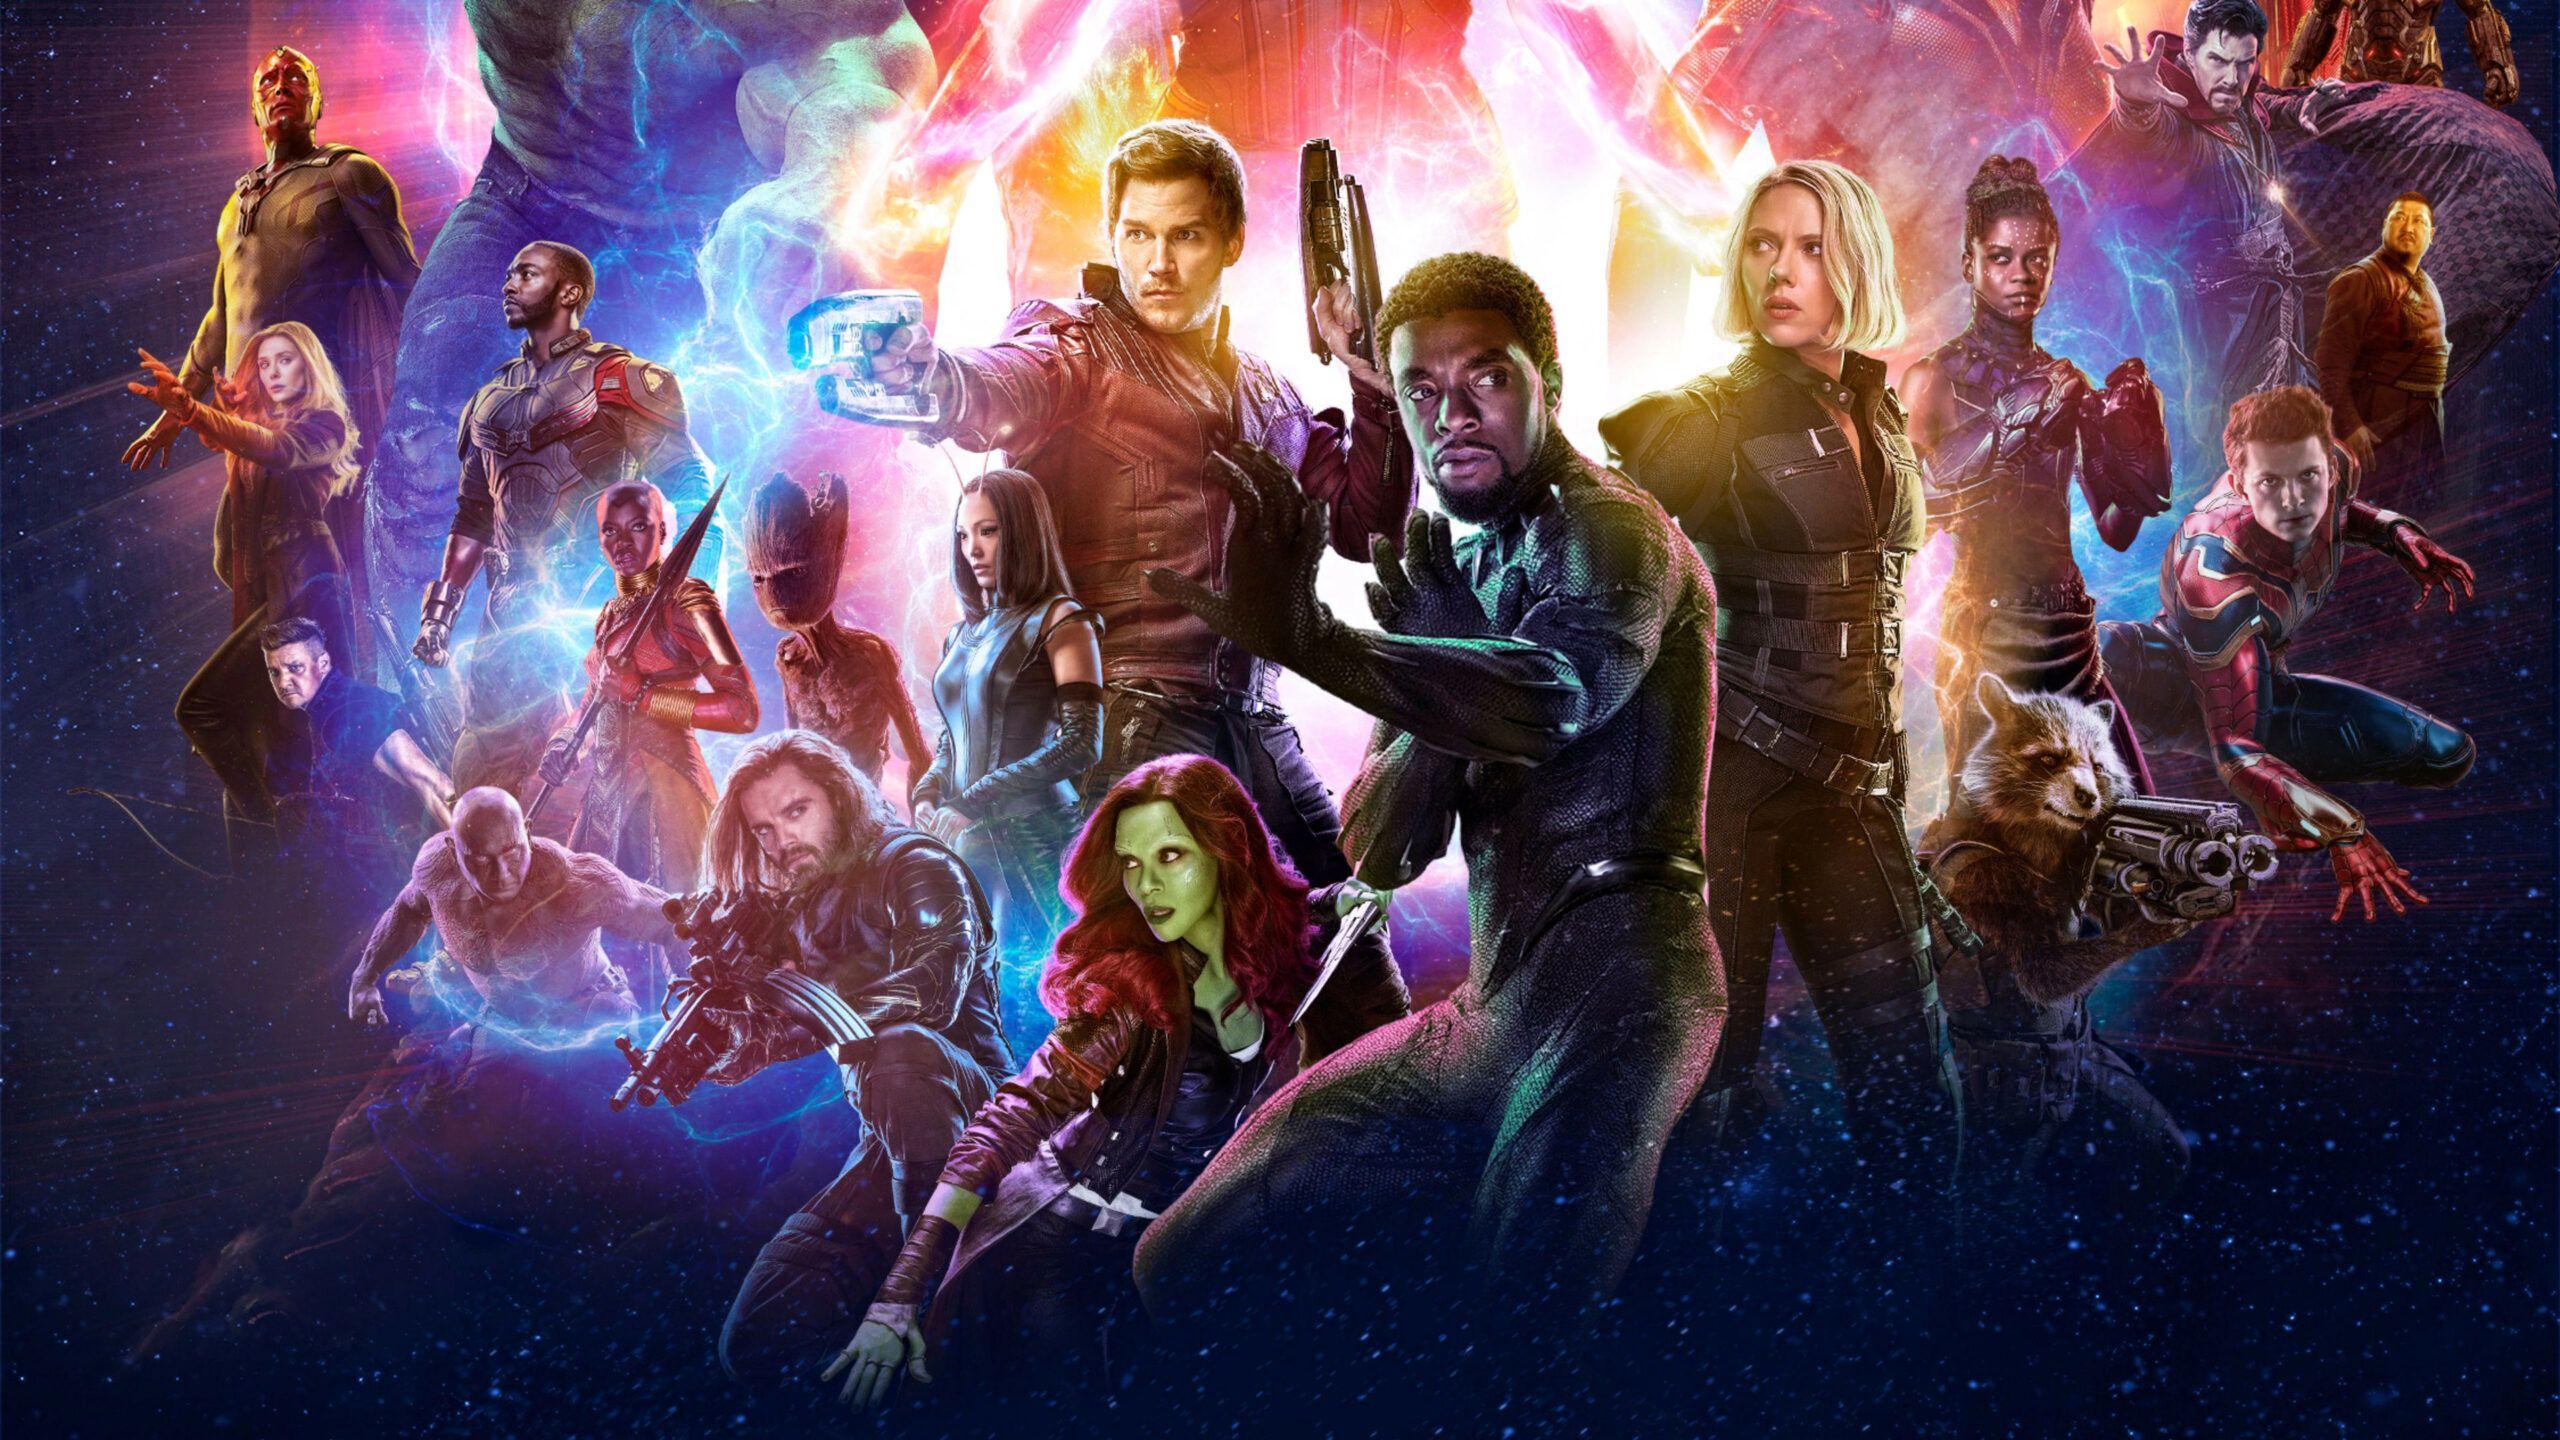 Fresh Avengers Endgame Wallpapers Black Panther Wallpaper